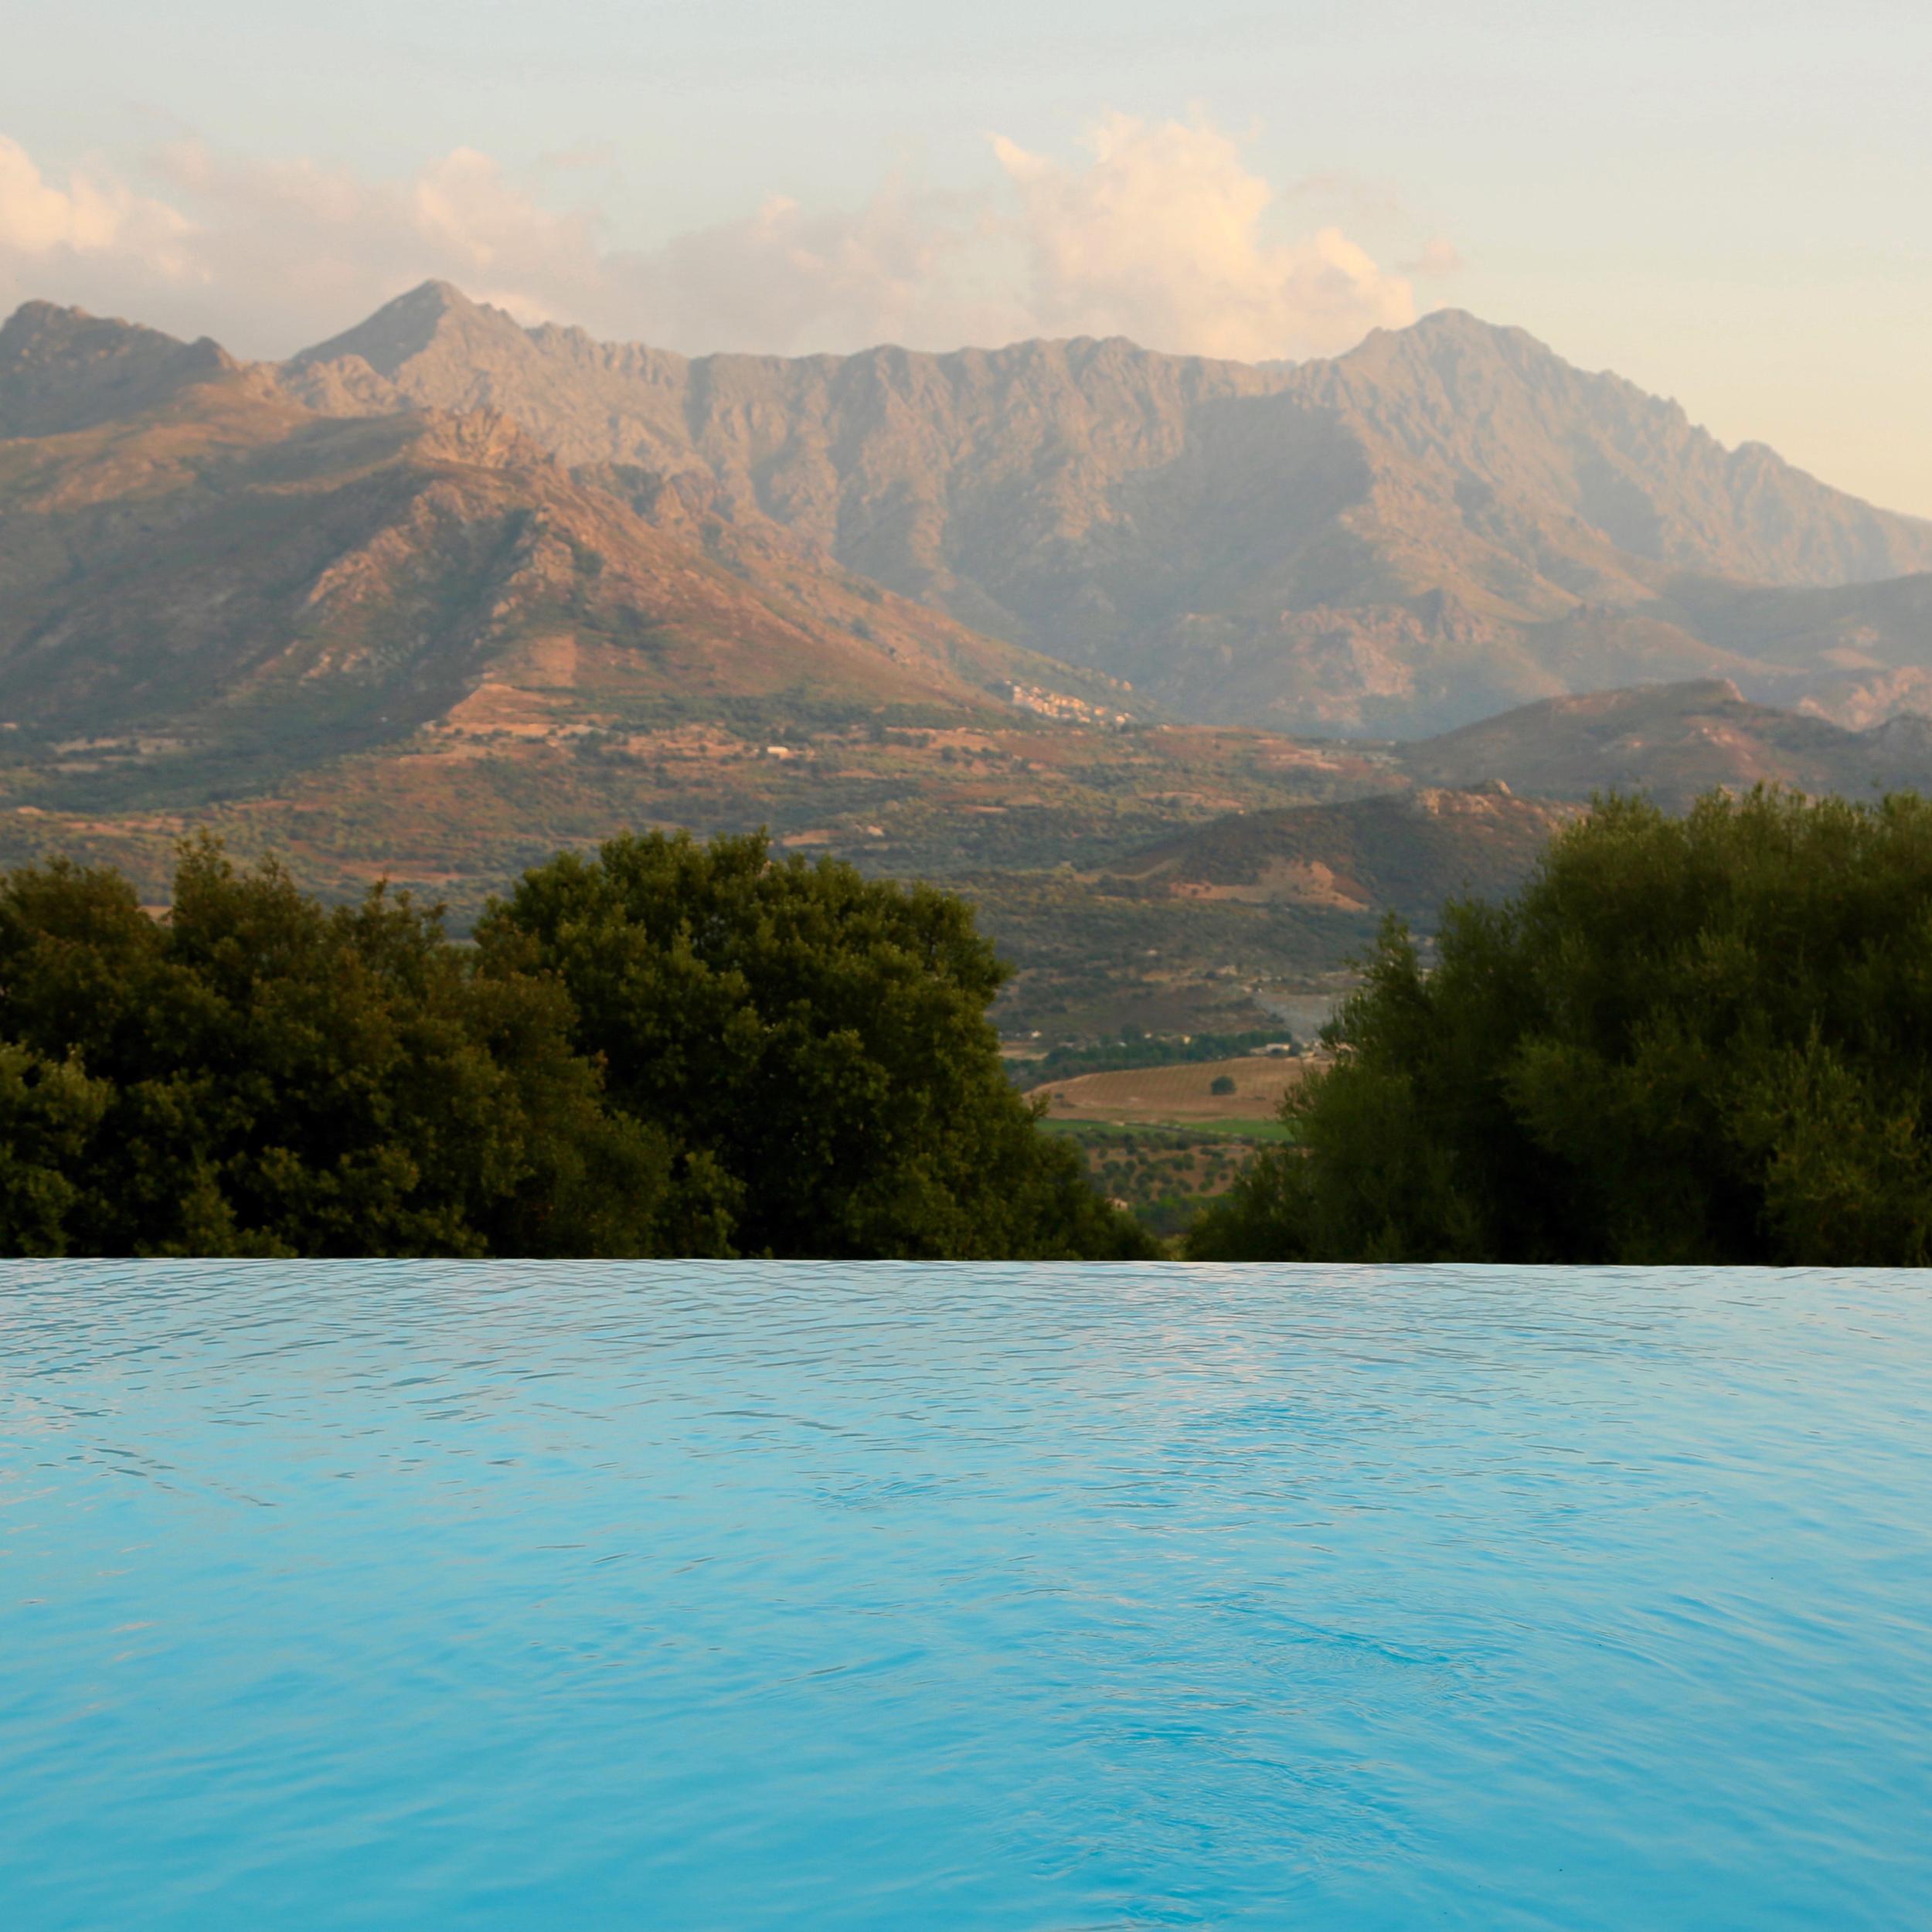 A Piattatella pool view mountains